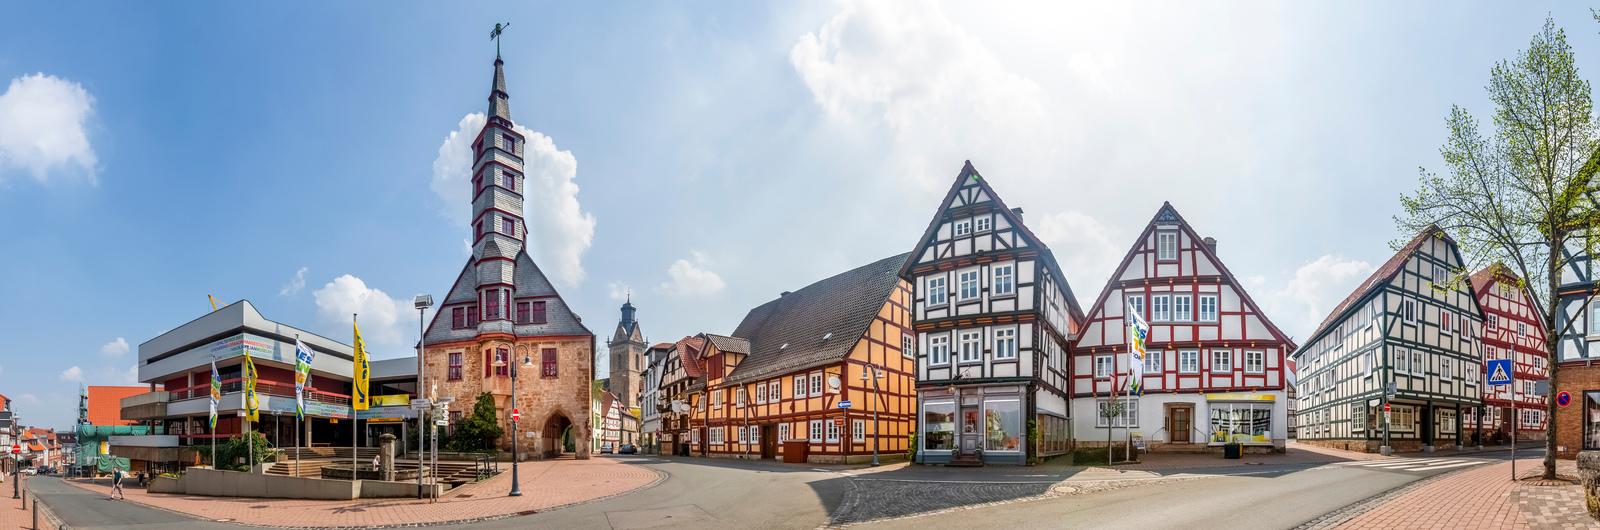 korbach city header